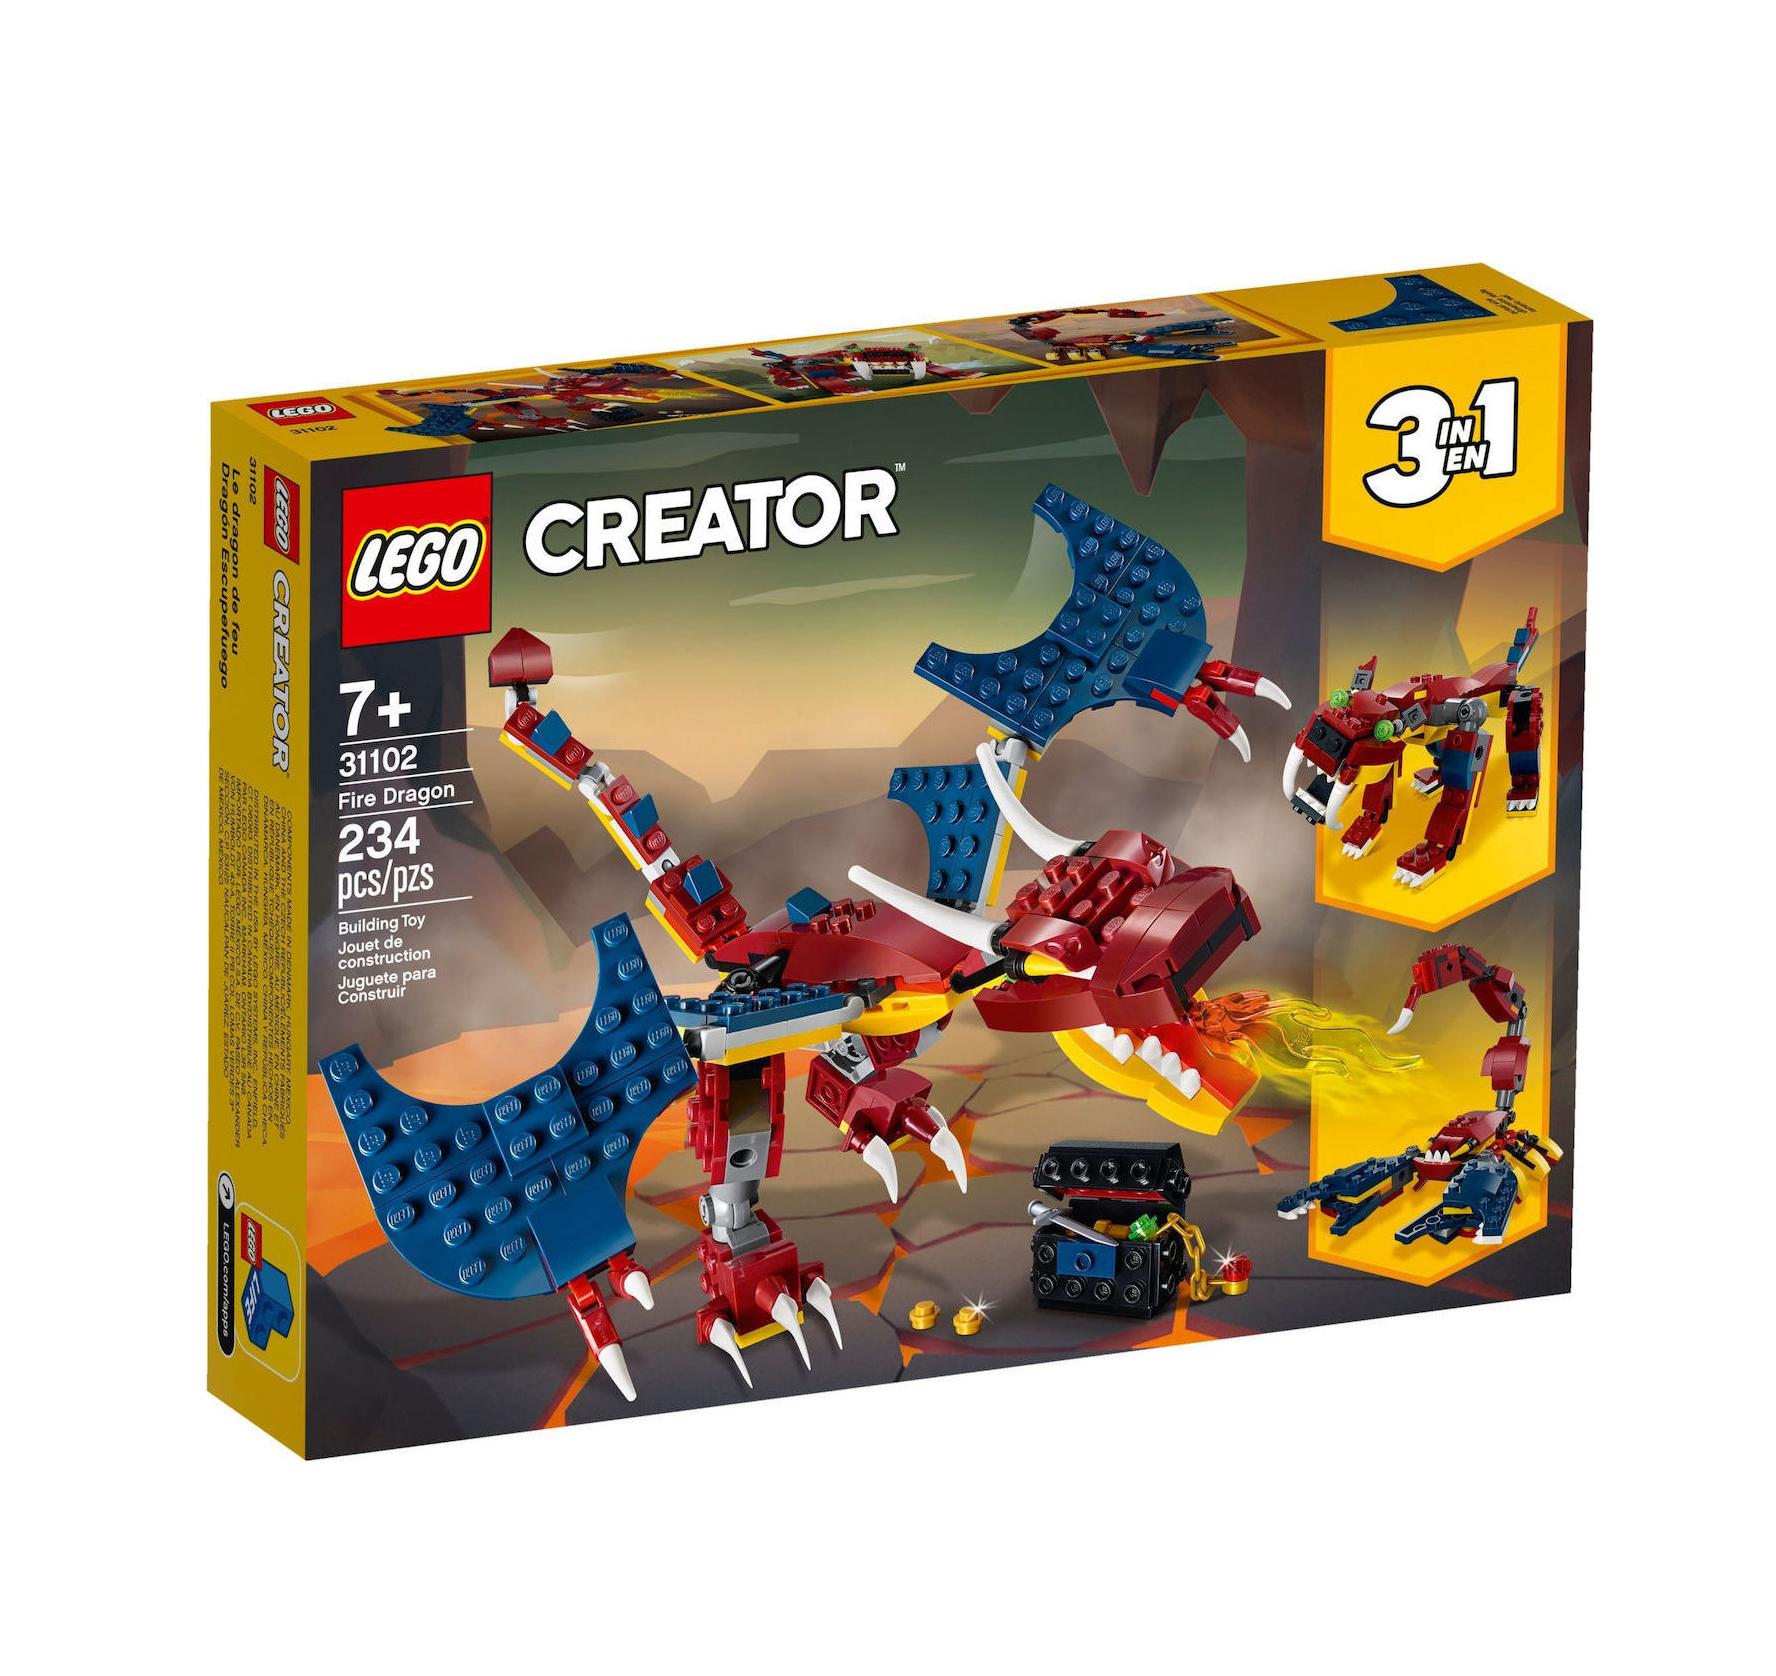 Lego Creator 3-in-1: Fire Dragon 31102